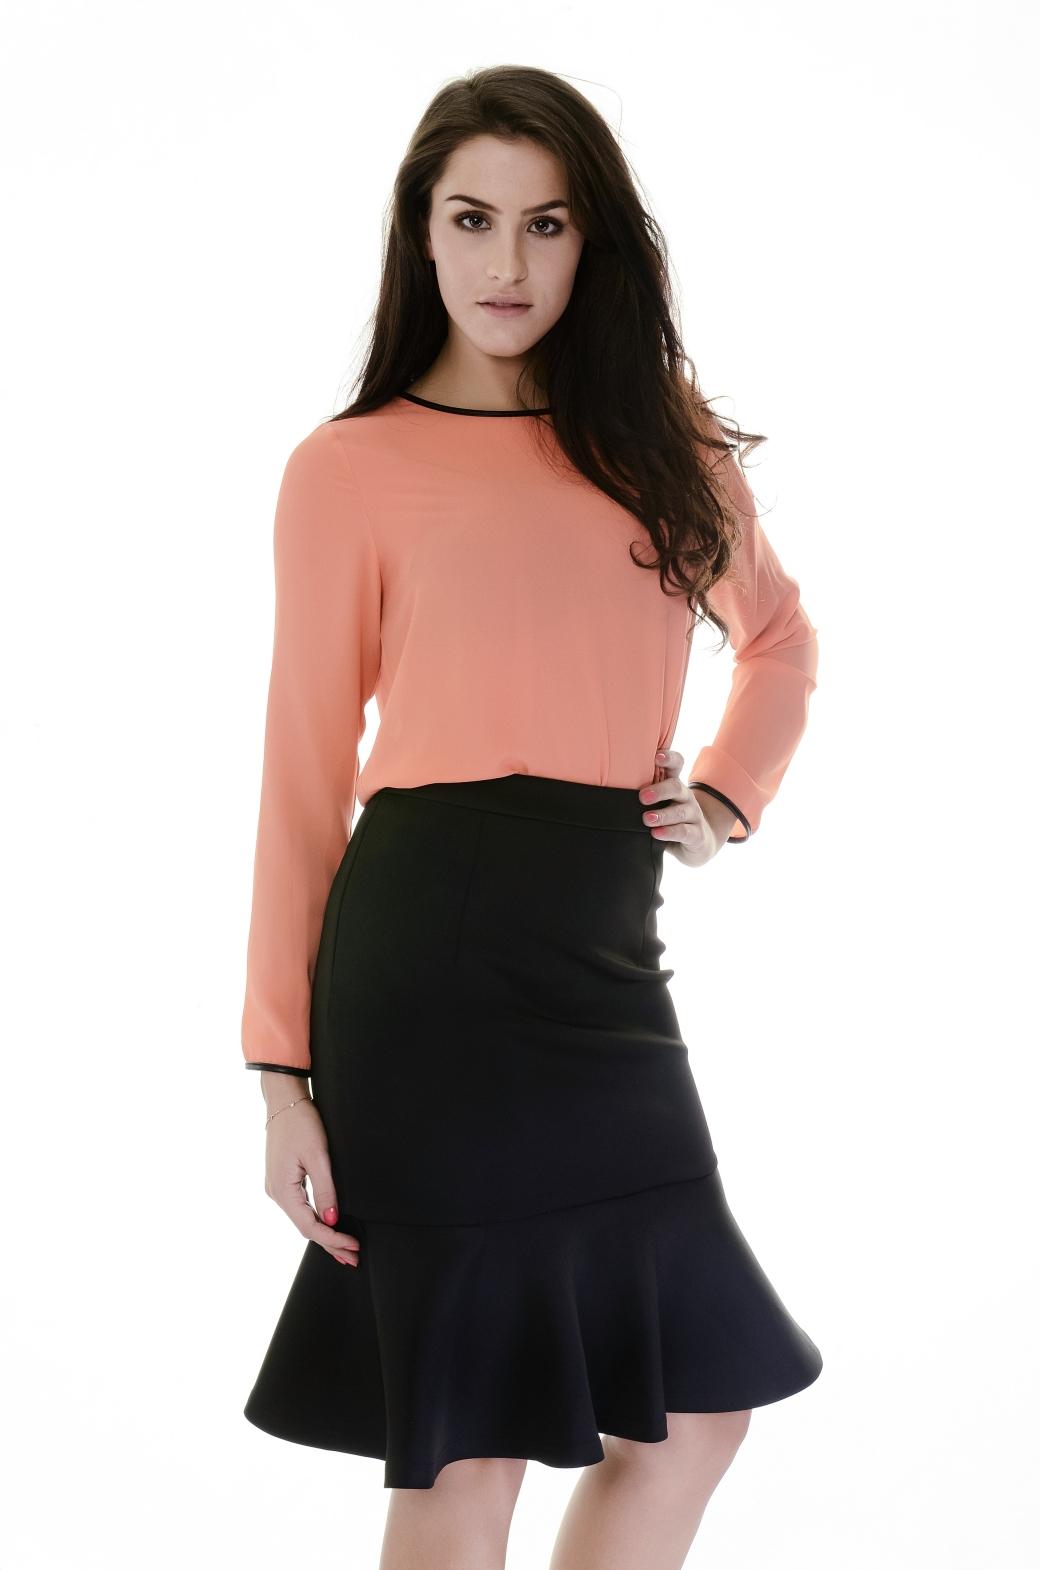 peach top with black peplum skirt